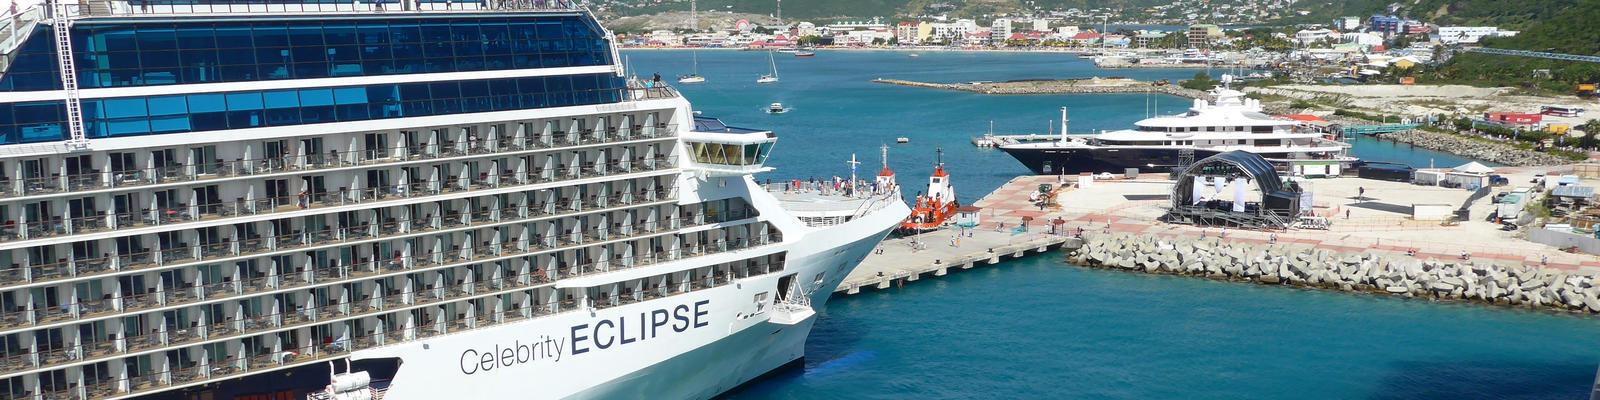 5 Hilarious Cruise Pier Runners Cruise Critic